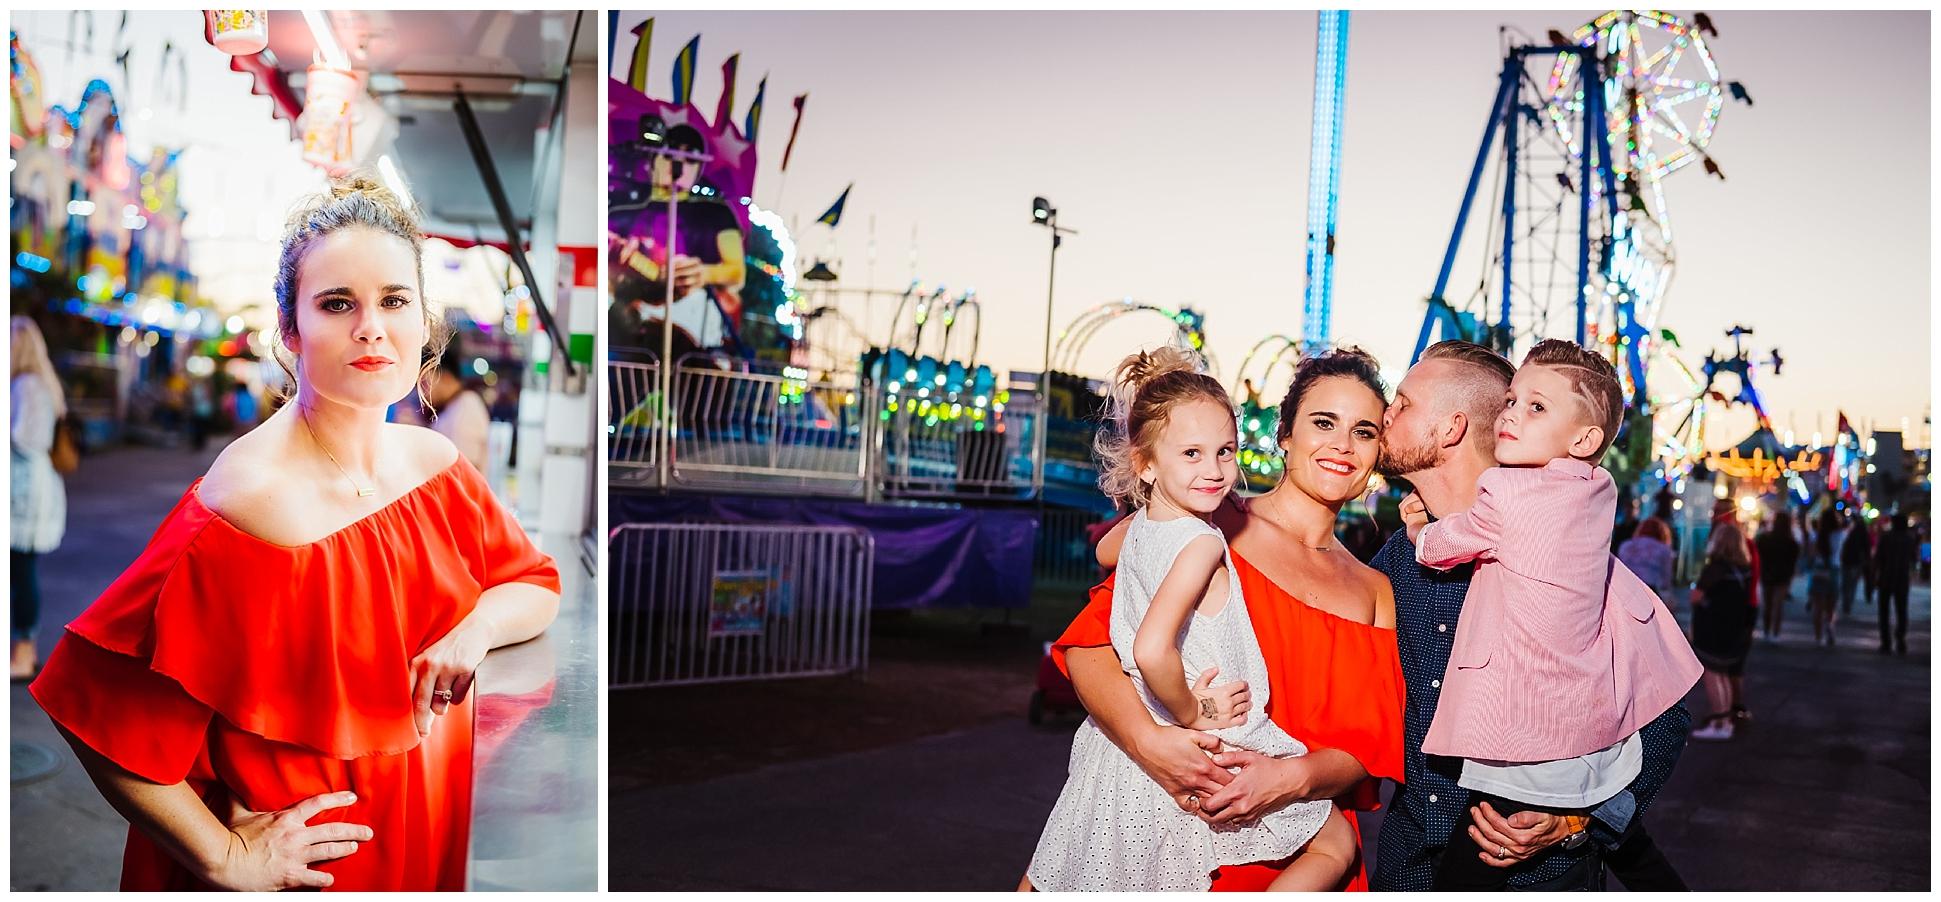 Tampa-colorful-fair-amusement park-family session_0044.jpg